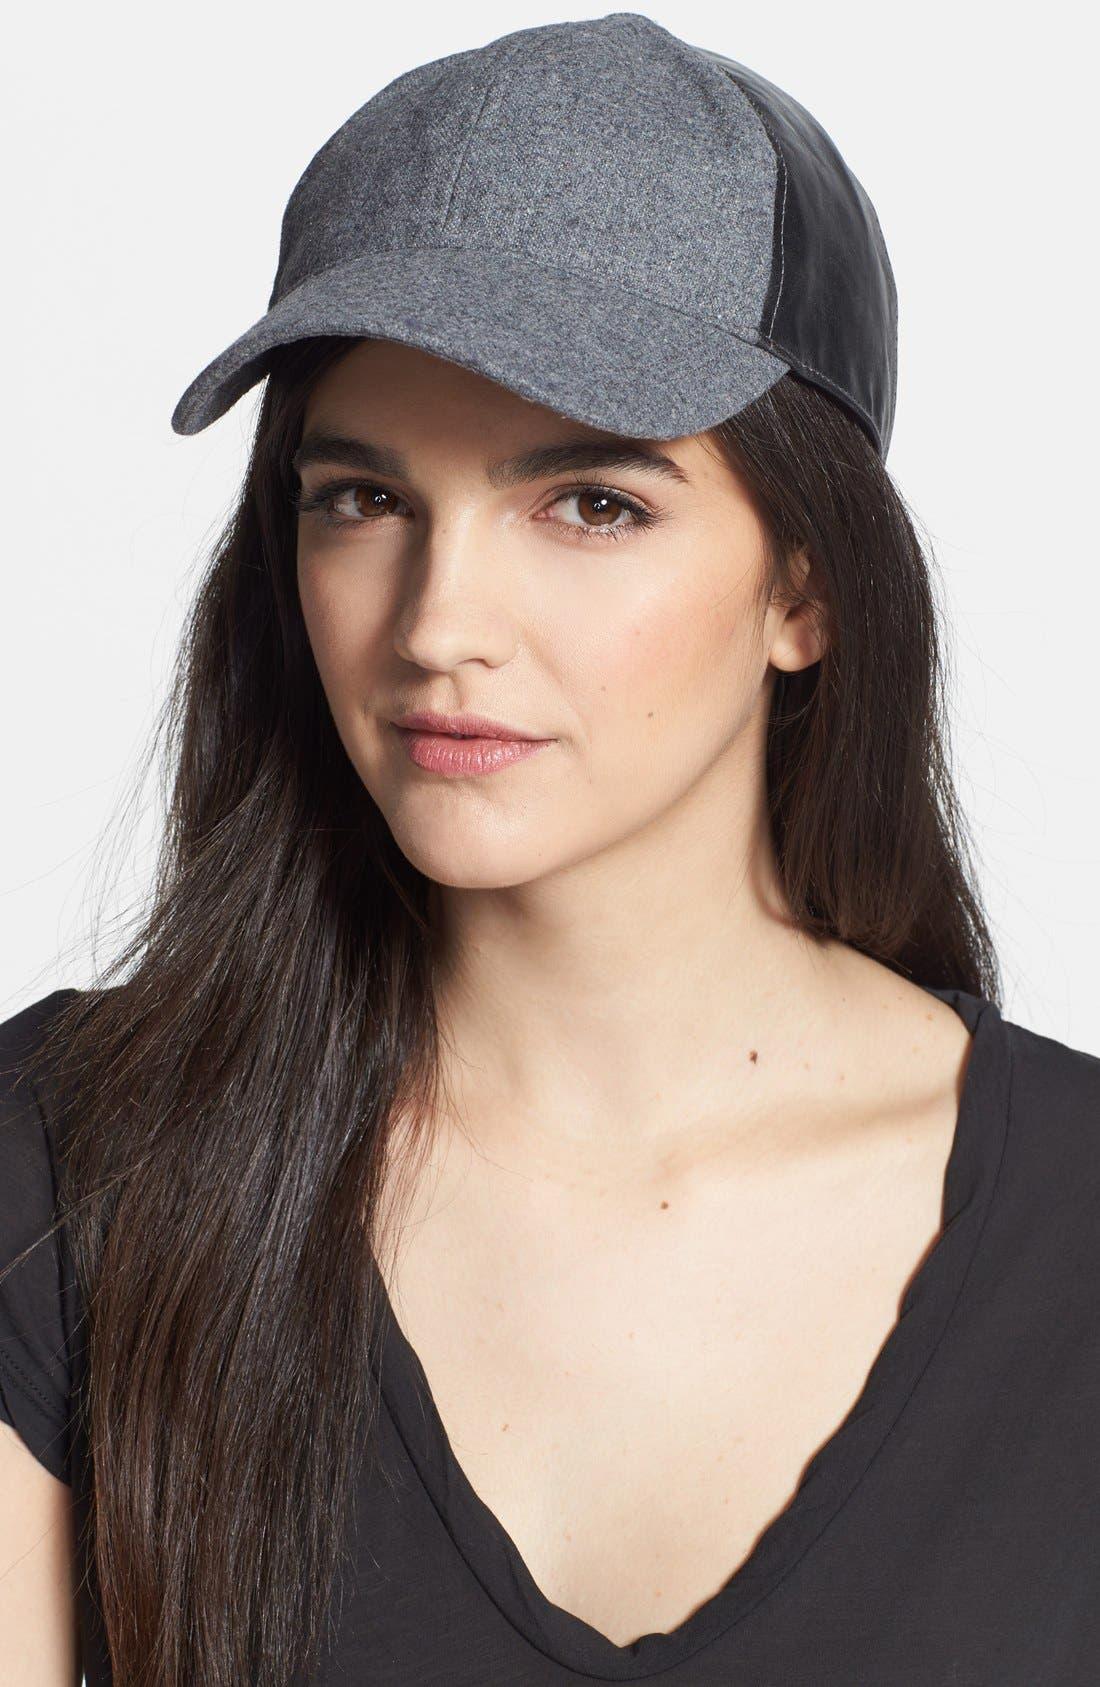 Alternate Image 1 Selected - August Hat 'Home Run' Adjustable Baseball Cap